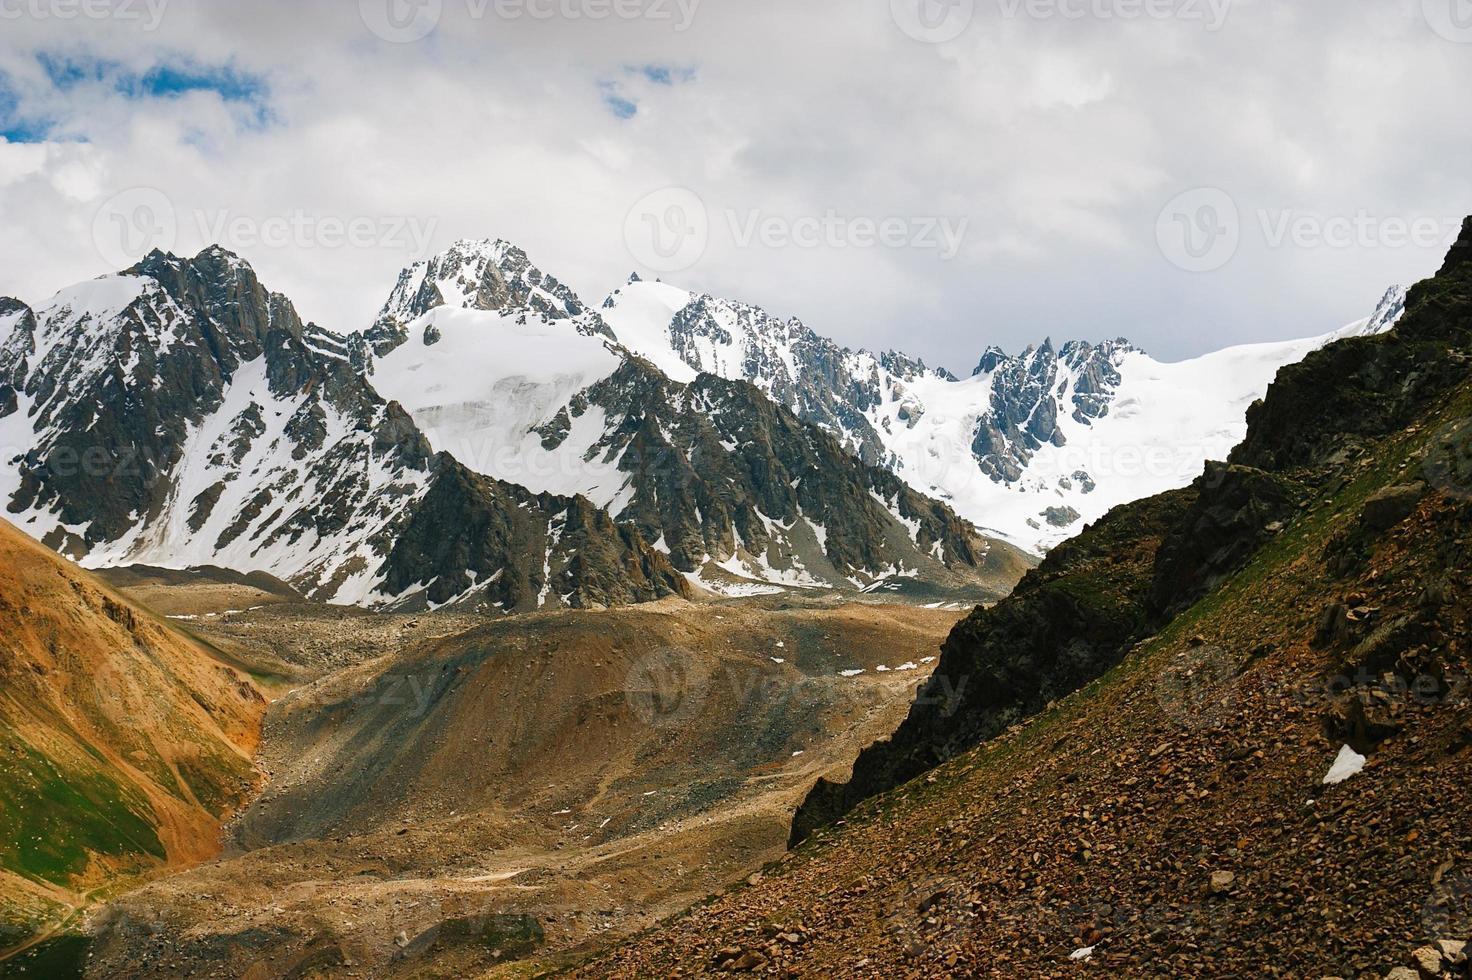 belos picos e montanhas de tien shan. foto